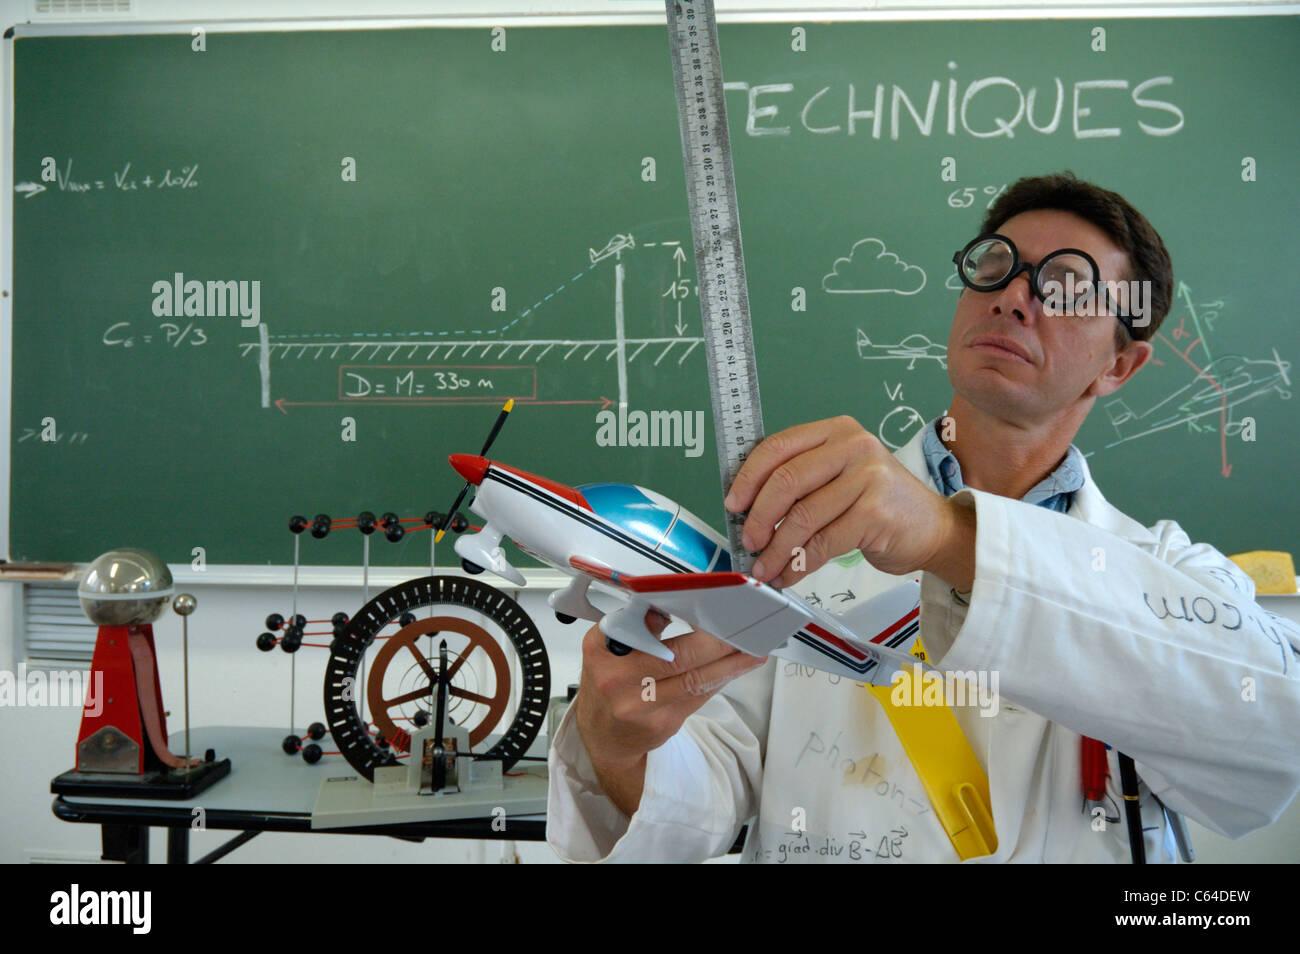 Lustige Lehrer Erklaren Motorflug Mit Modellflugzeug Stockfoto